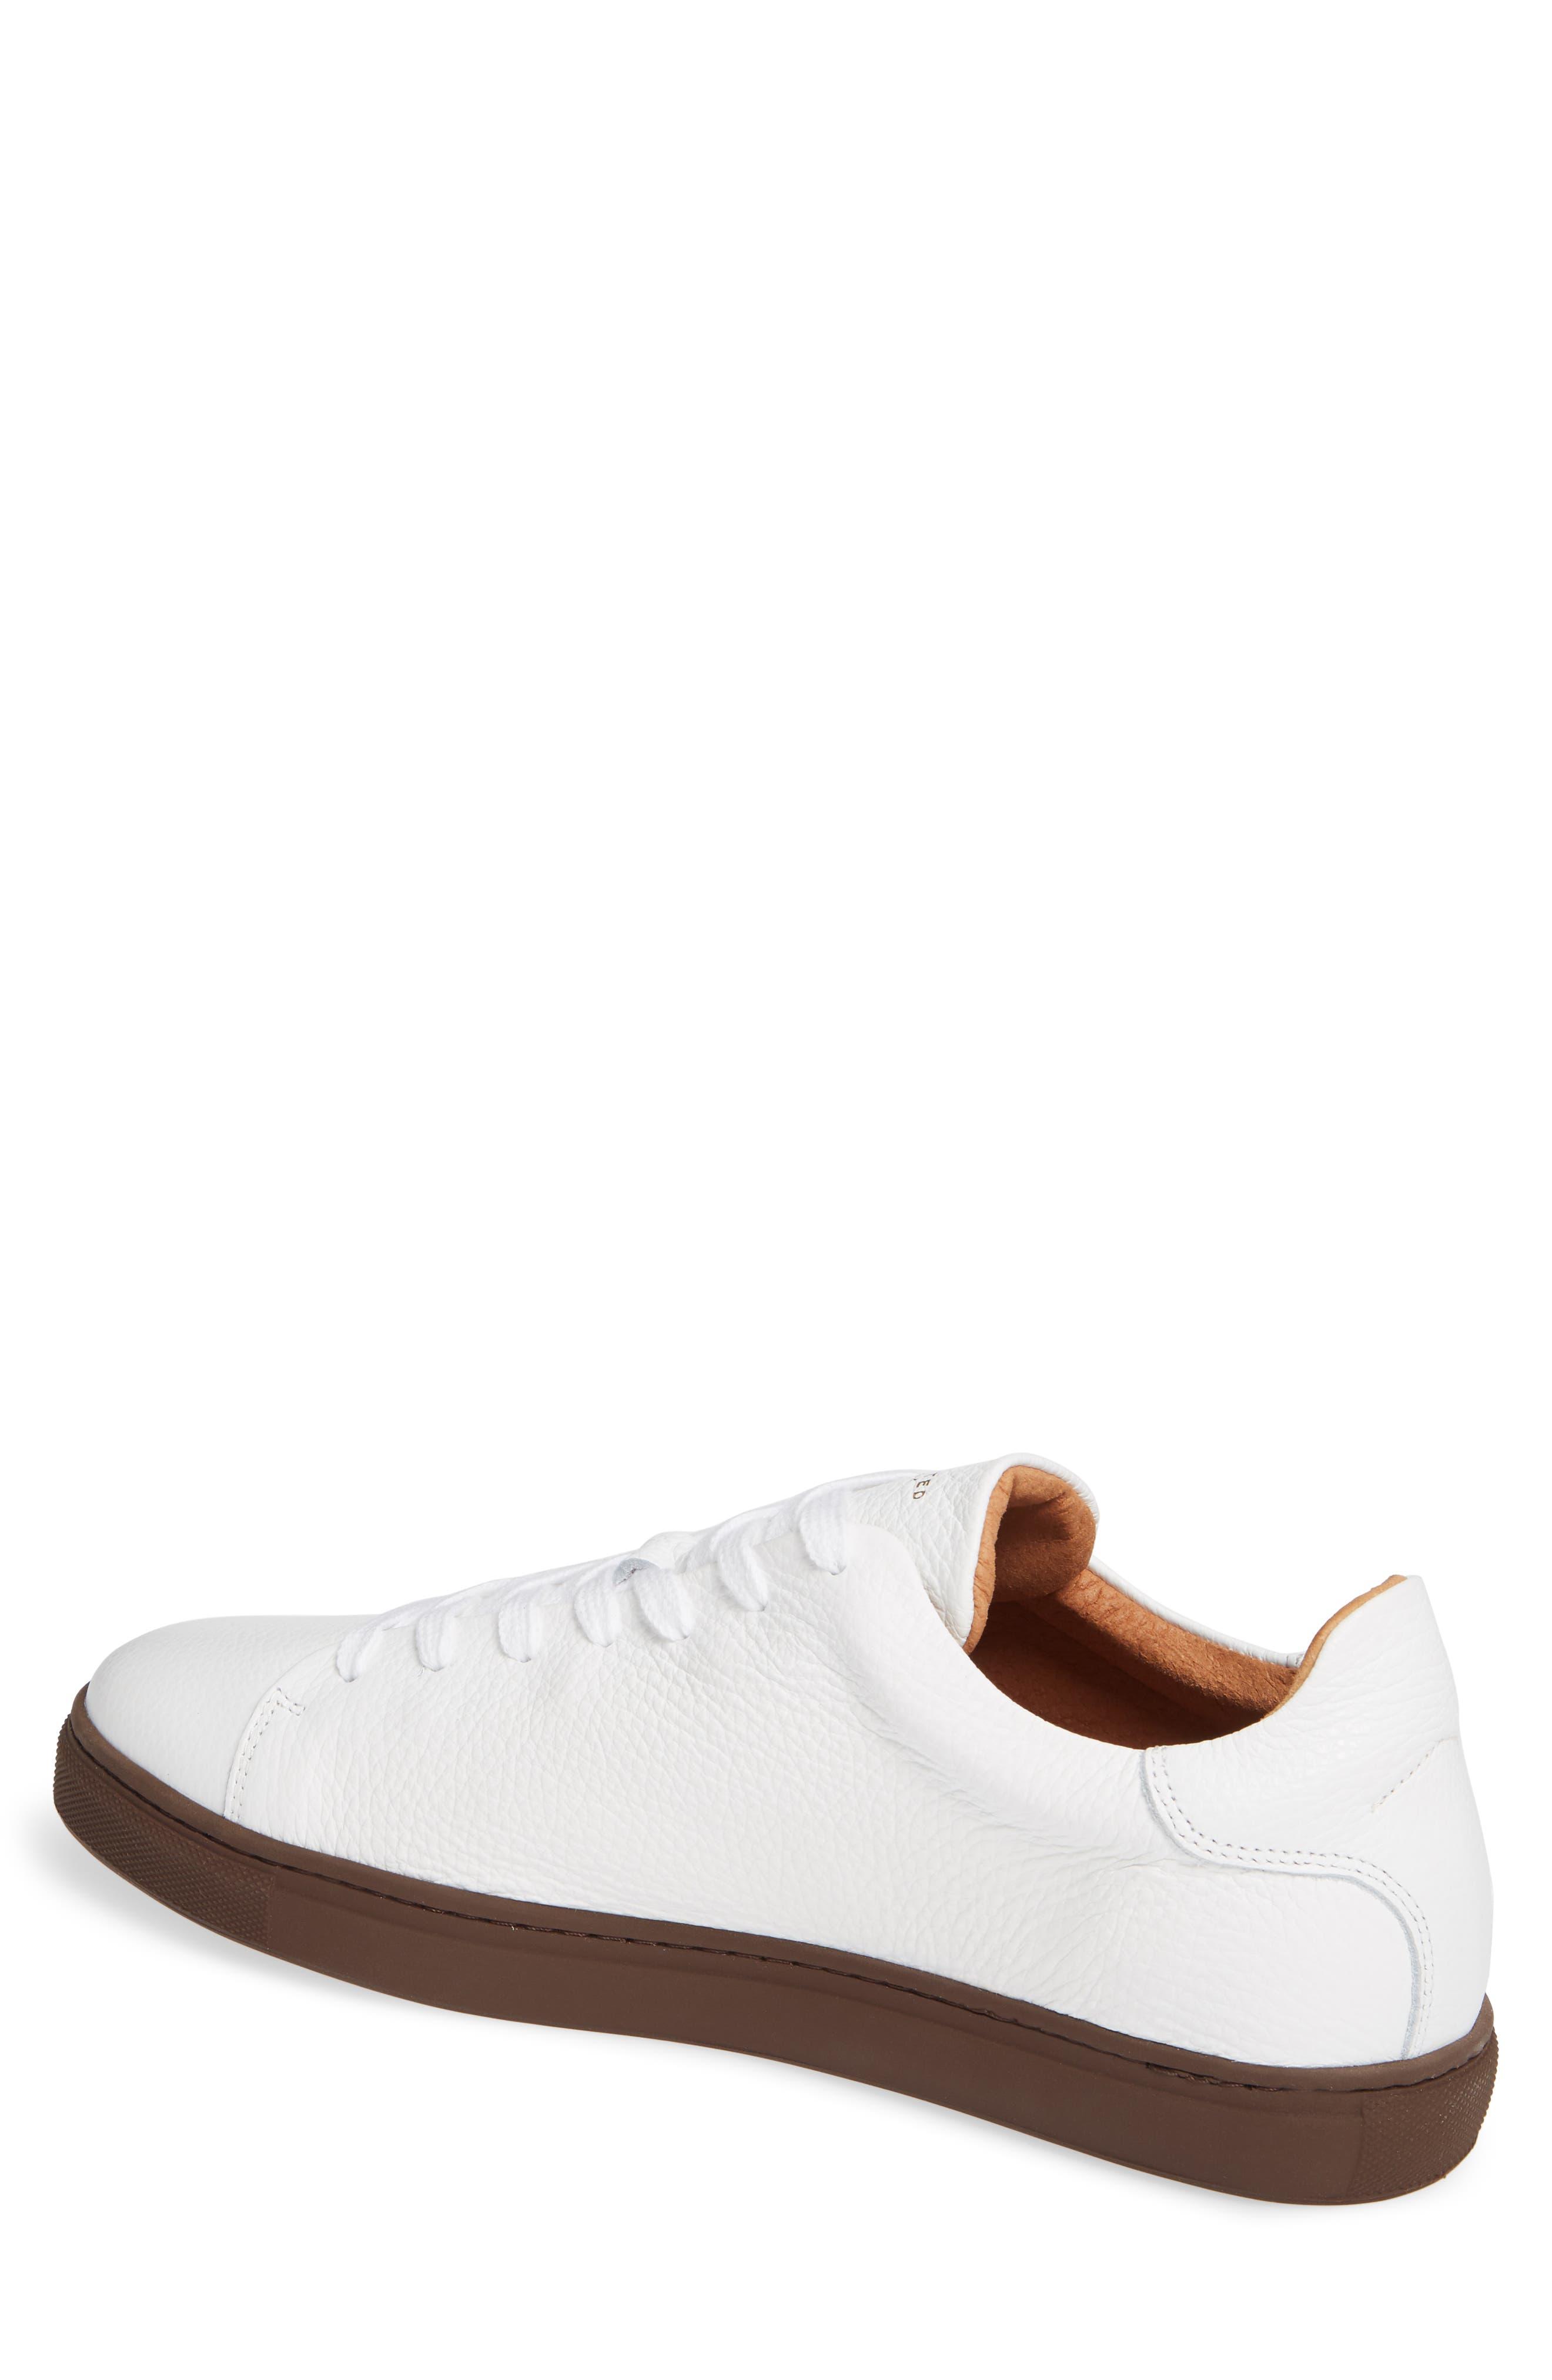 David Sneaker,                             Alternate thumbnail 2, color,                             WHITE/ BURGUNDY SOLE